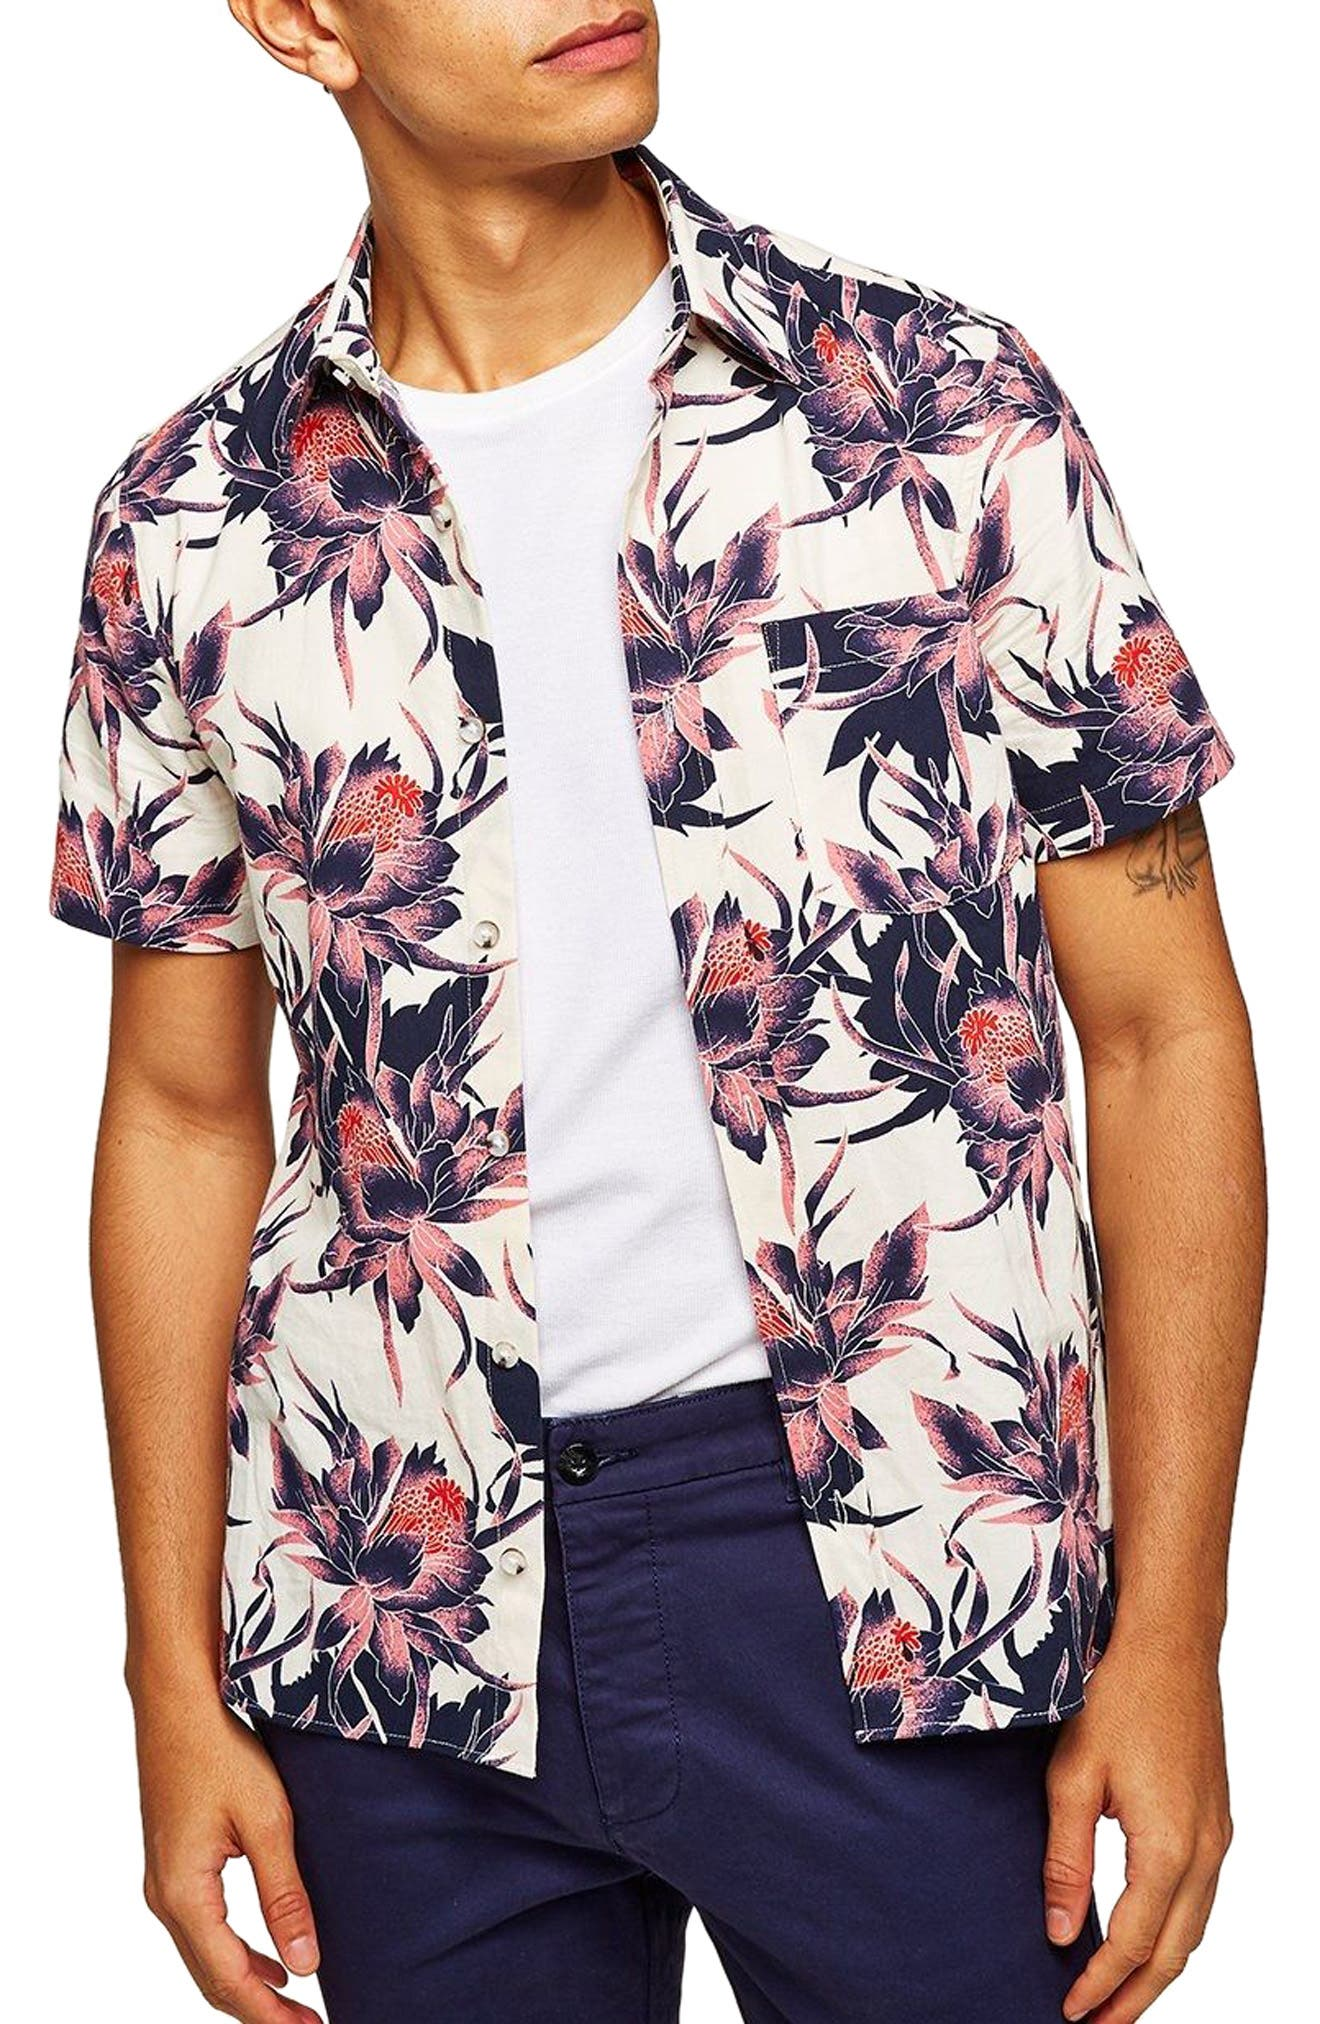 Floral Print Shirt,                             Main thumbnail 1, color,                             White Multi